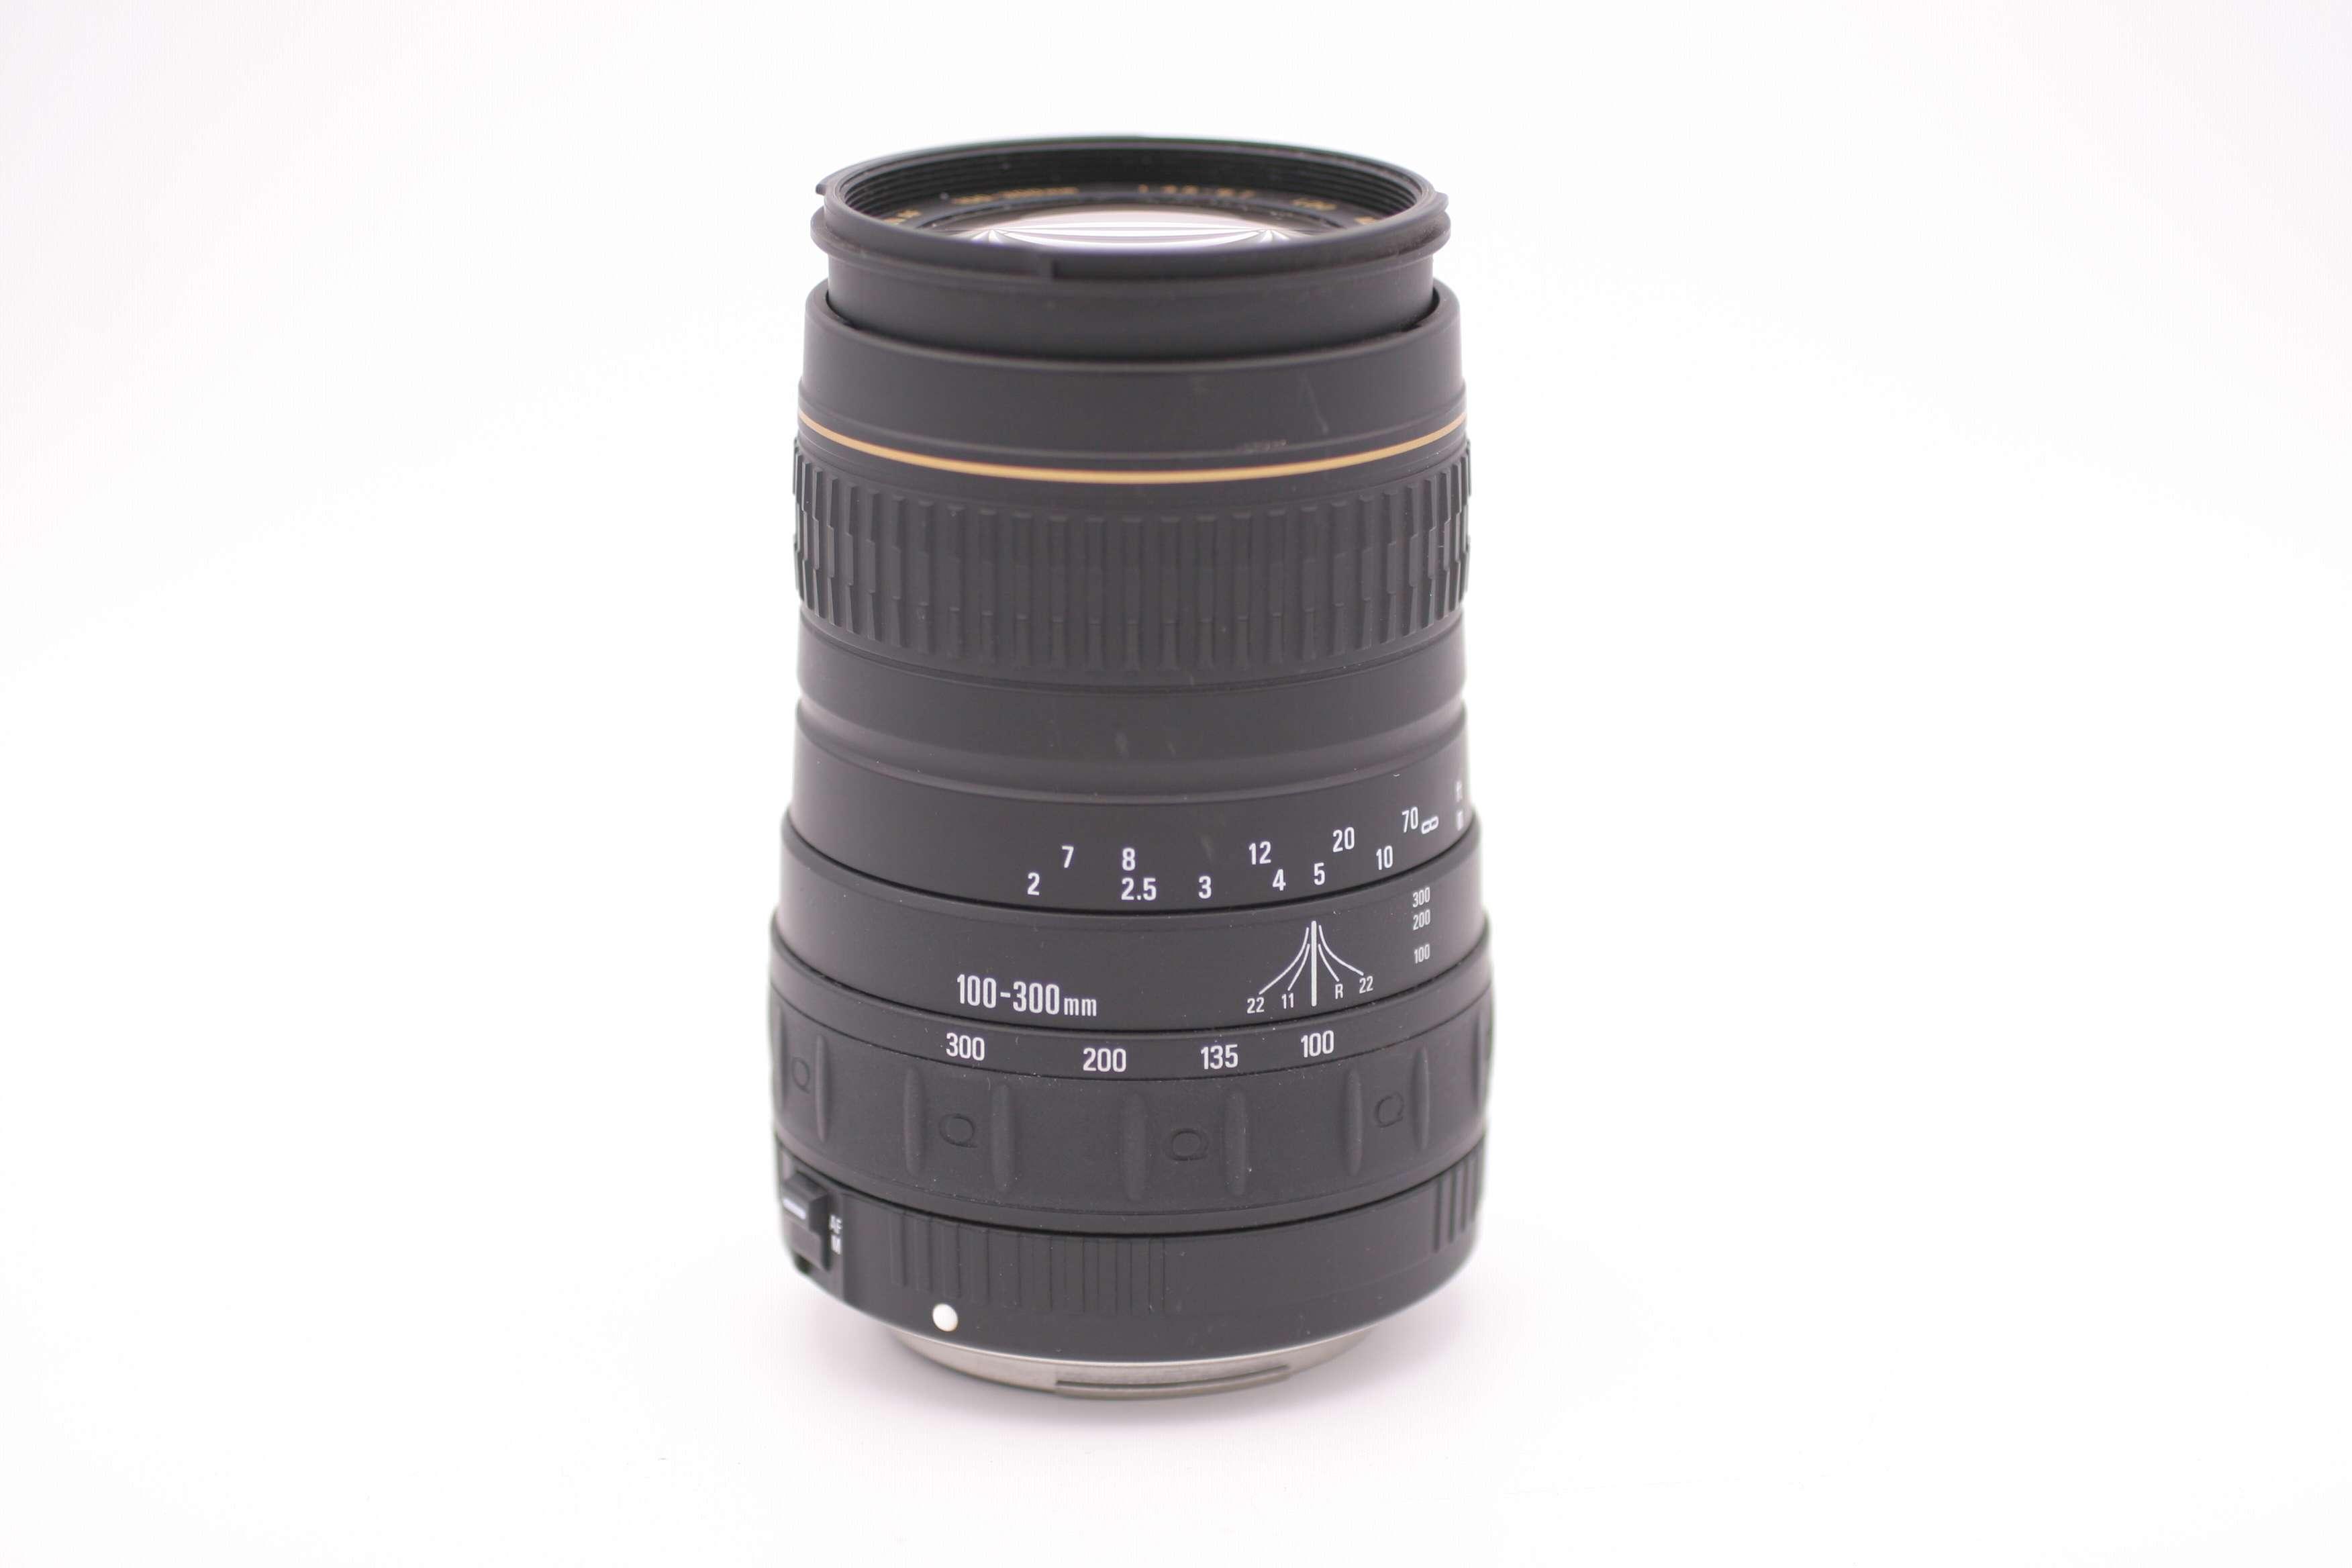 QUANTARAY 100-300mm f//4.5-6.7 LDO FOR NIKON AF